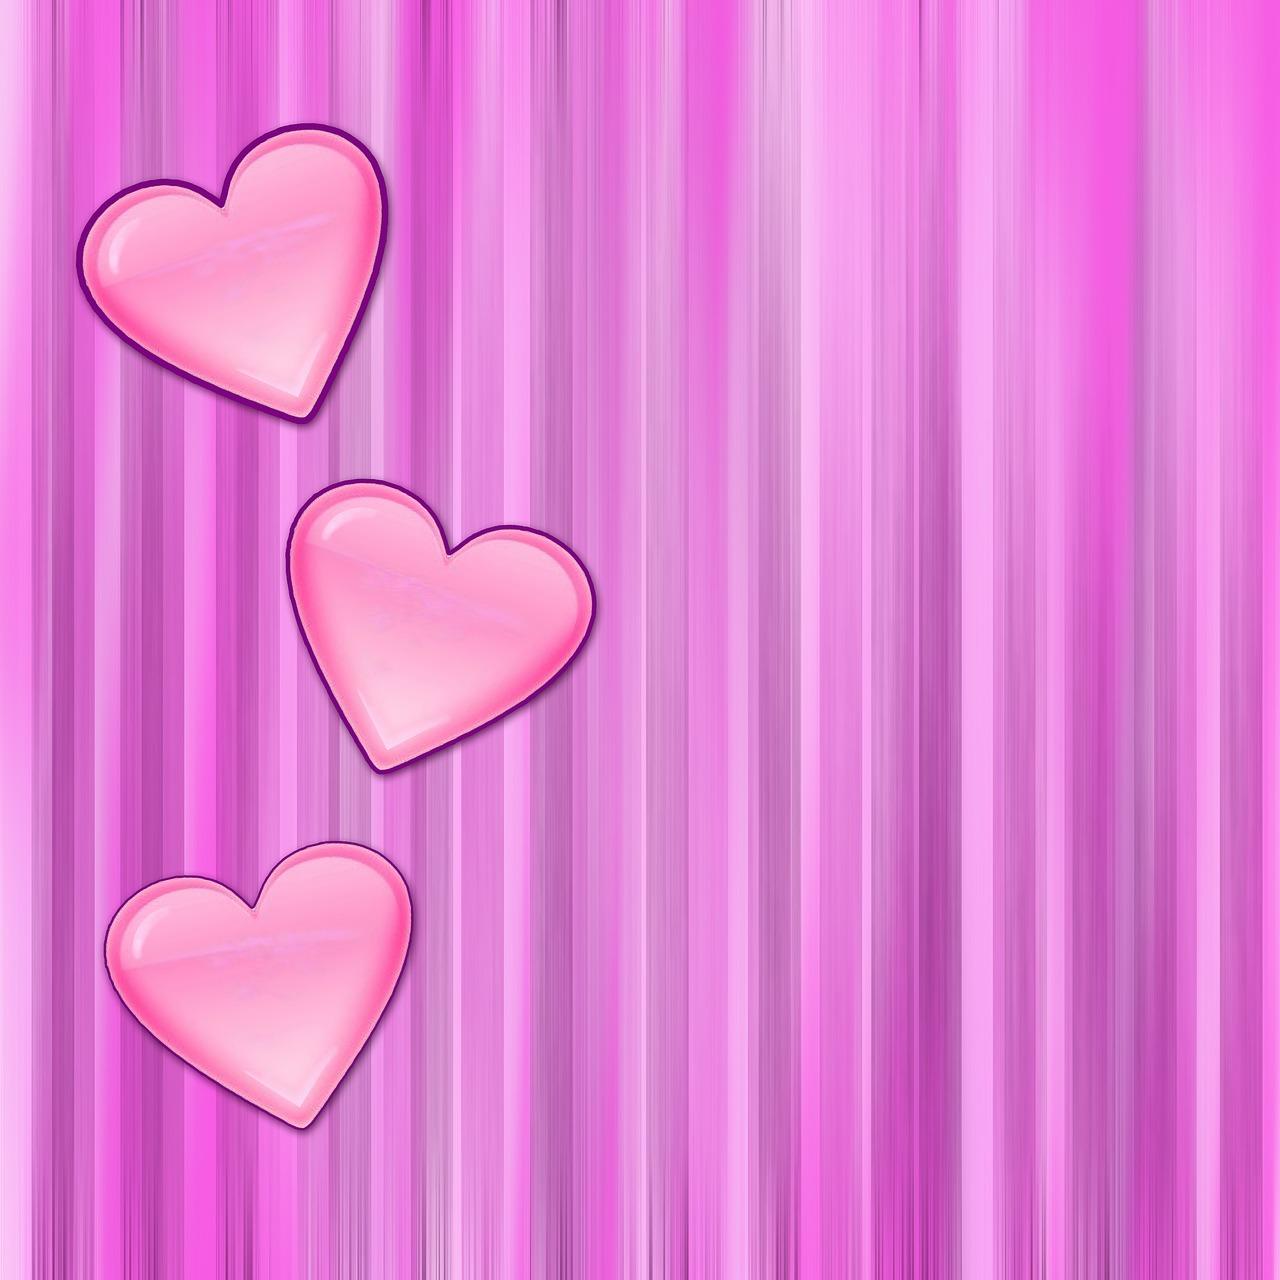 Картинка сердечки розовые, сад